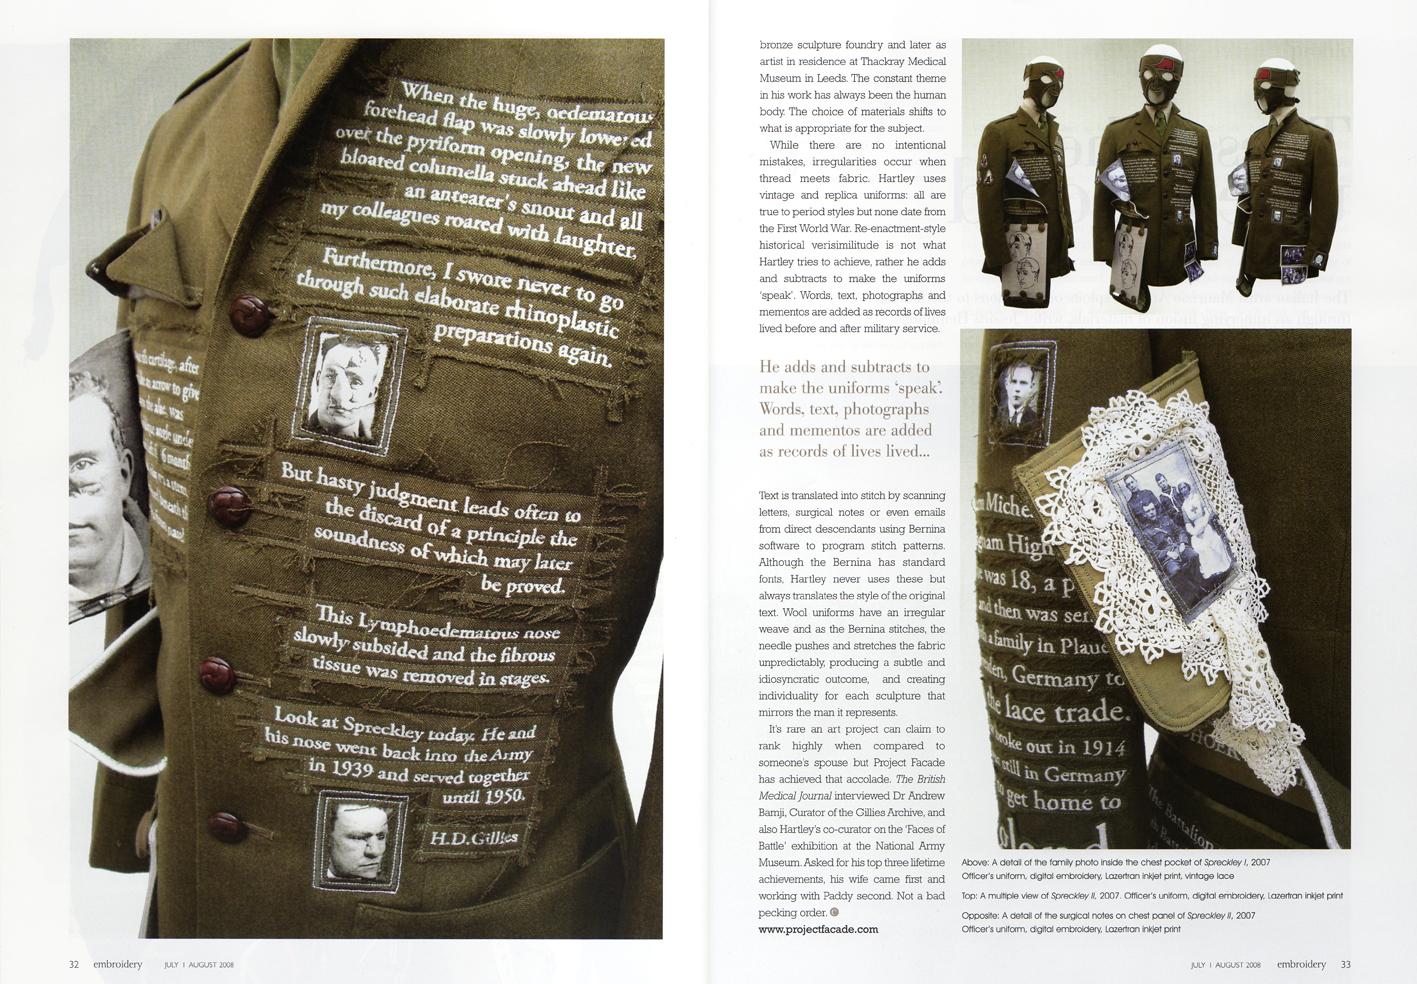 6.Embroidery Magazine.jpg